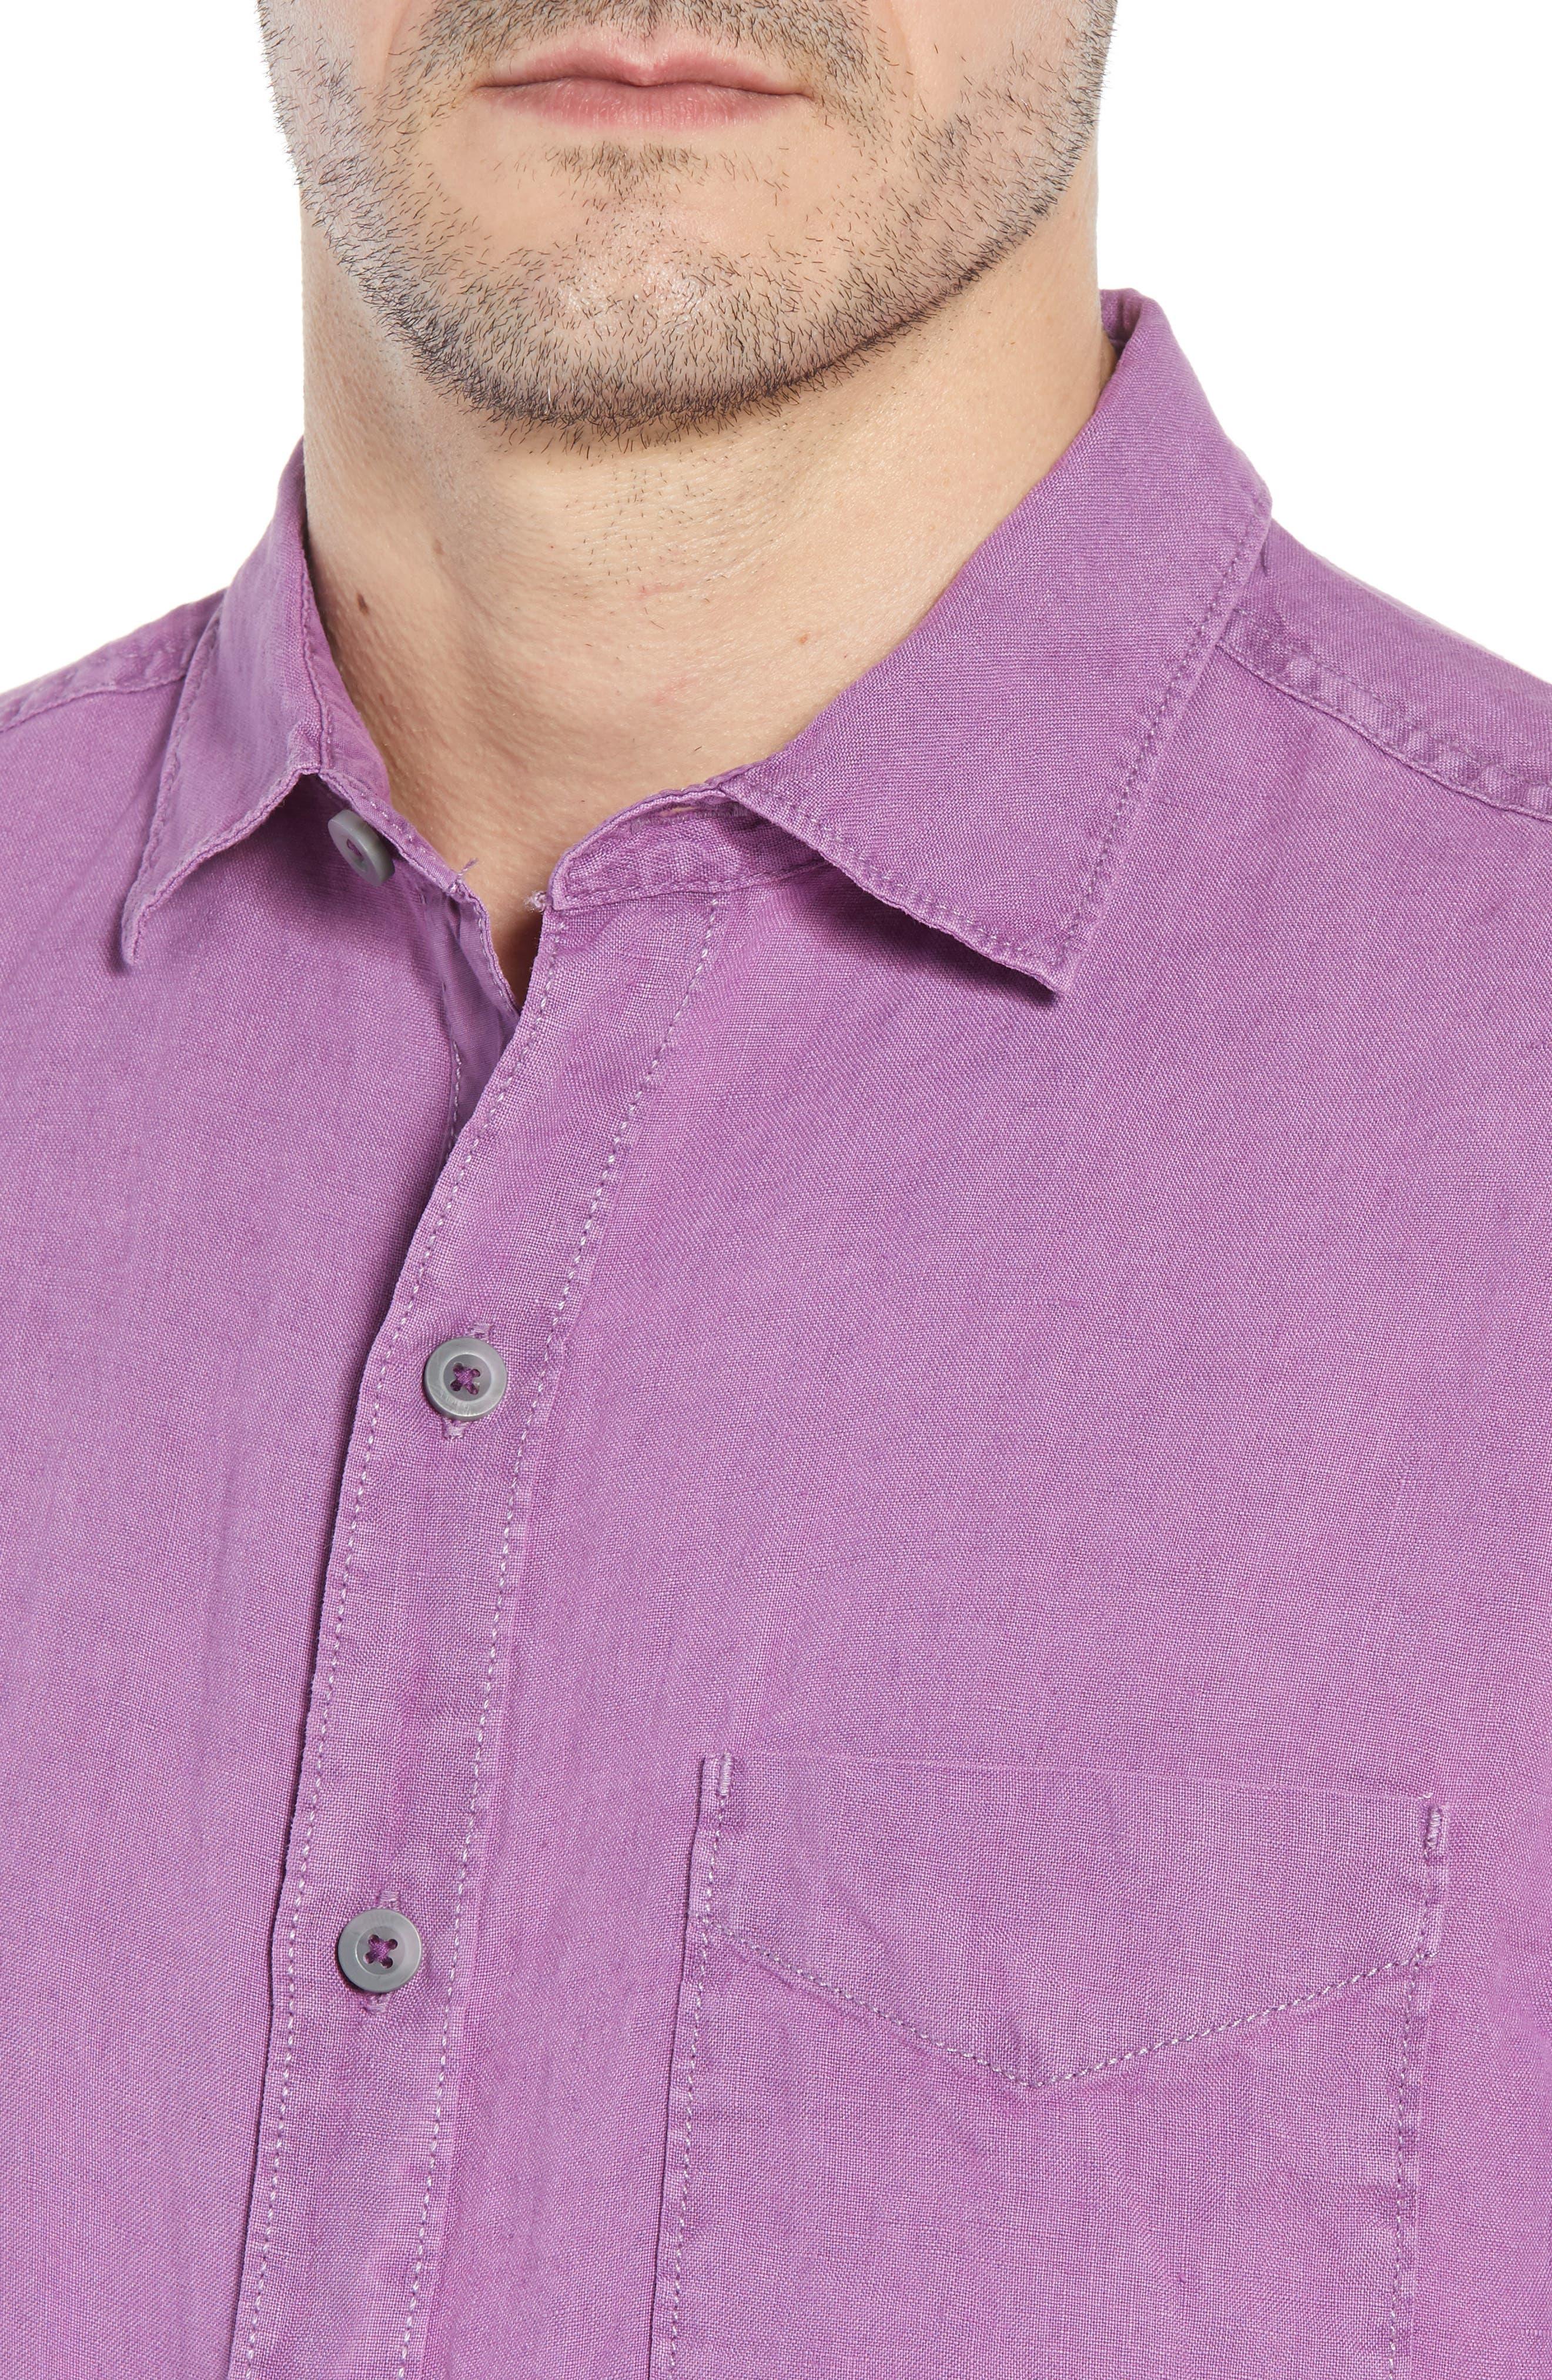 Seaspray Breezer Regular Fit Linen Sport Shirt,                             Alternate thumbnail 2, color,                             Sparkling Grape